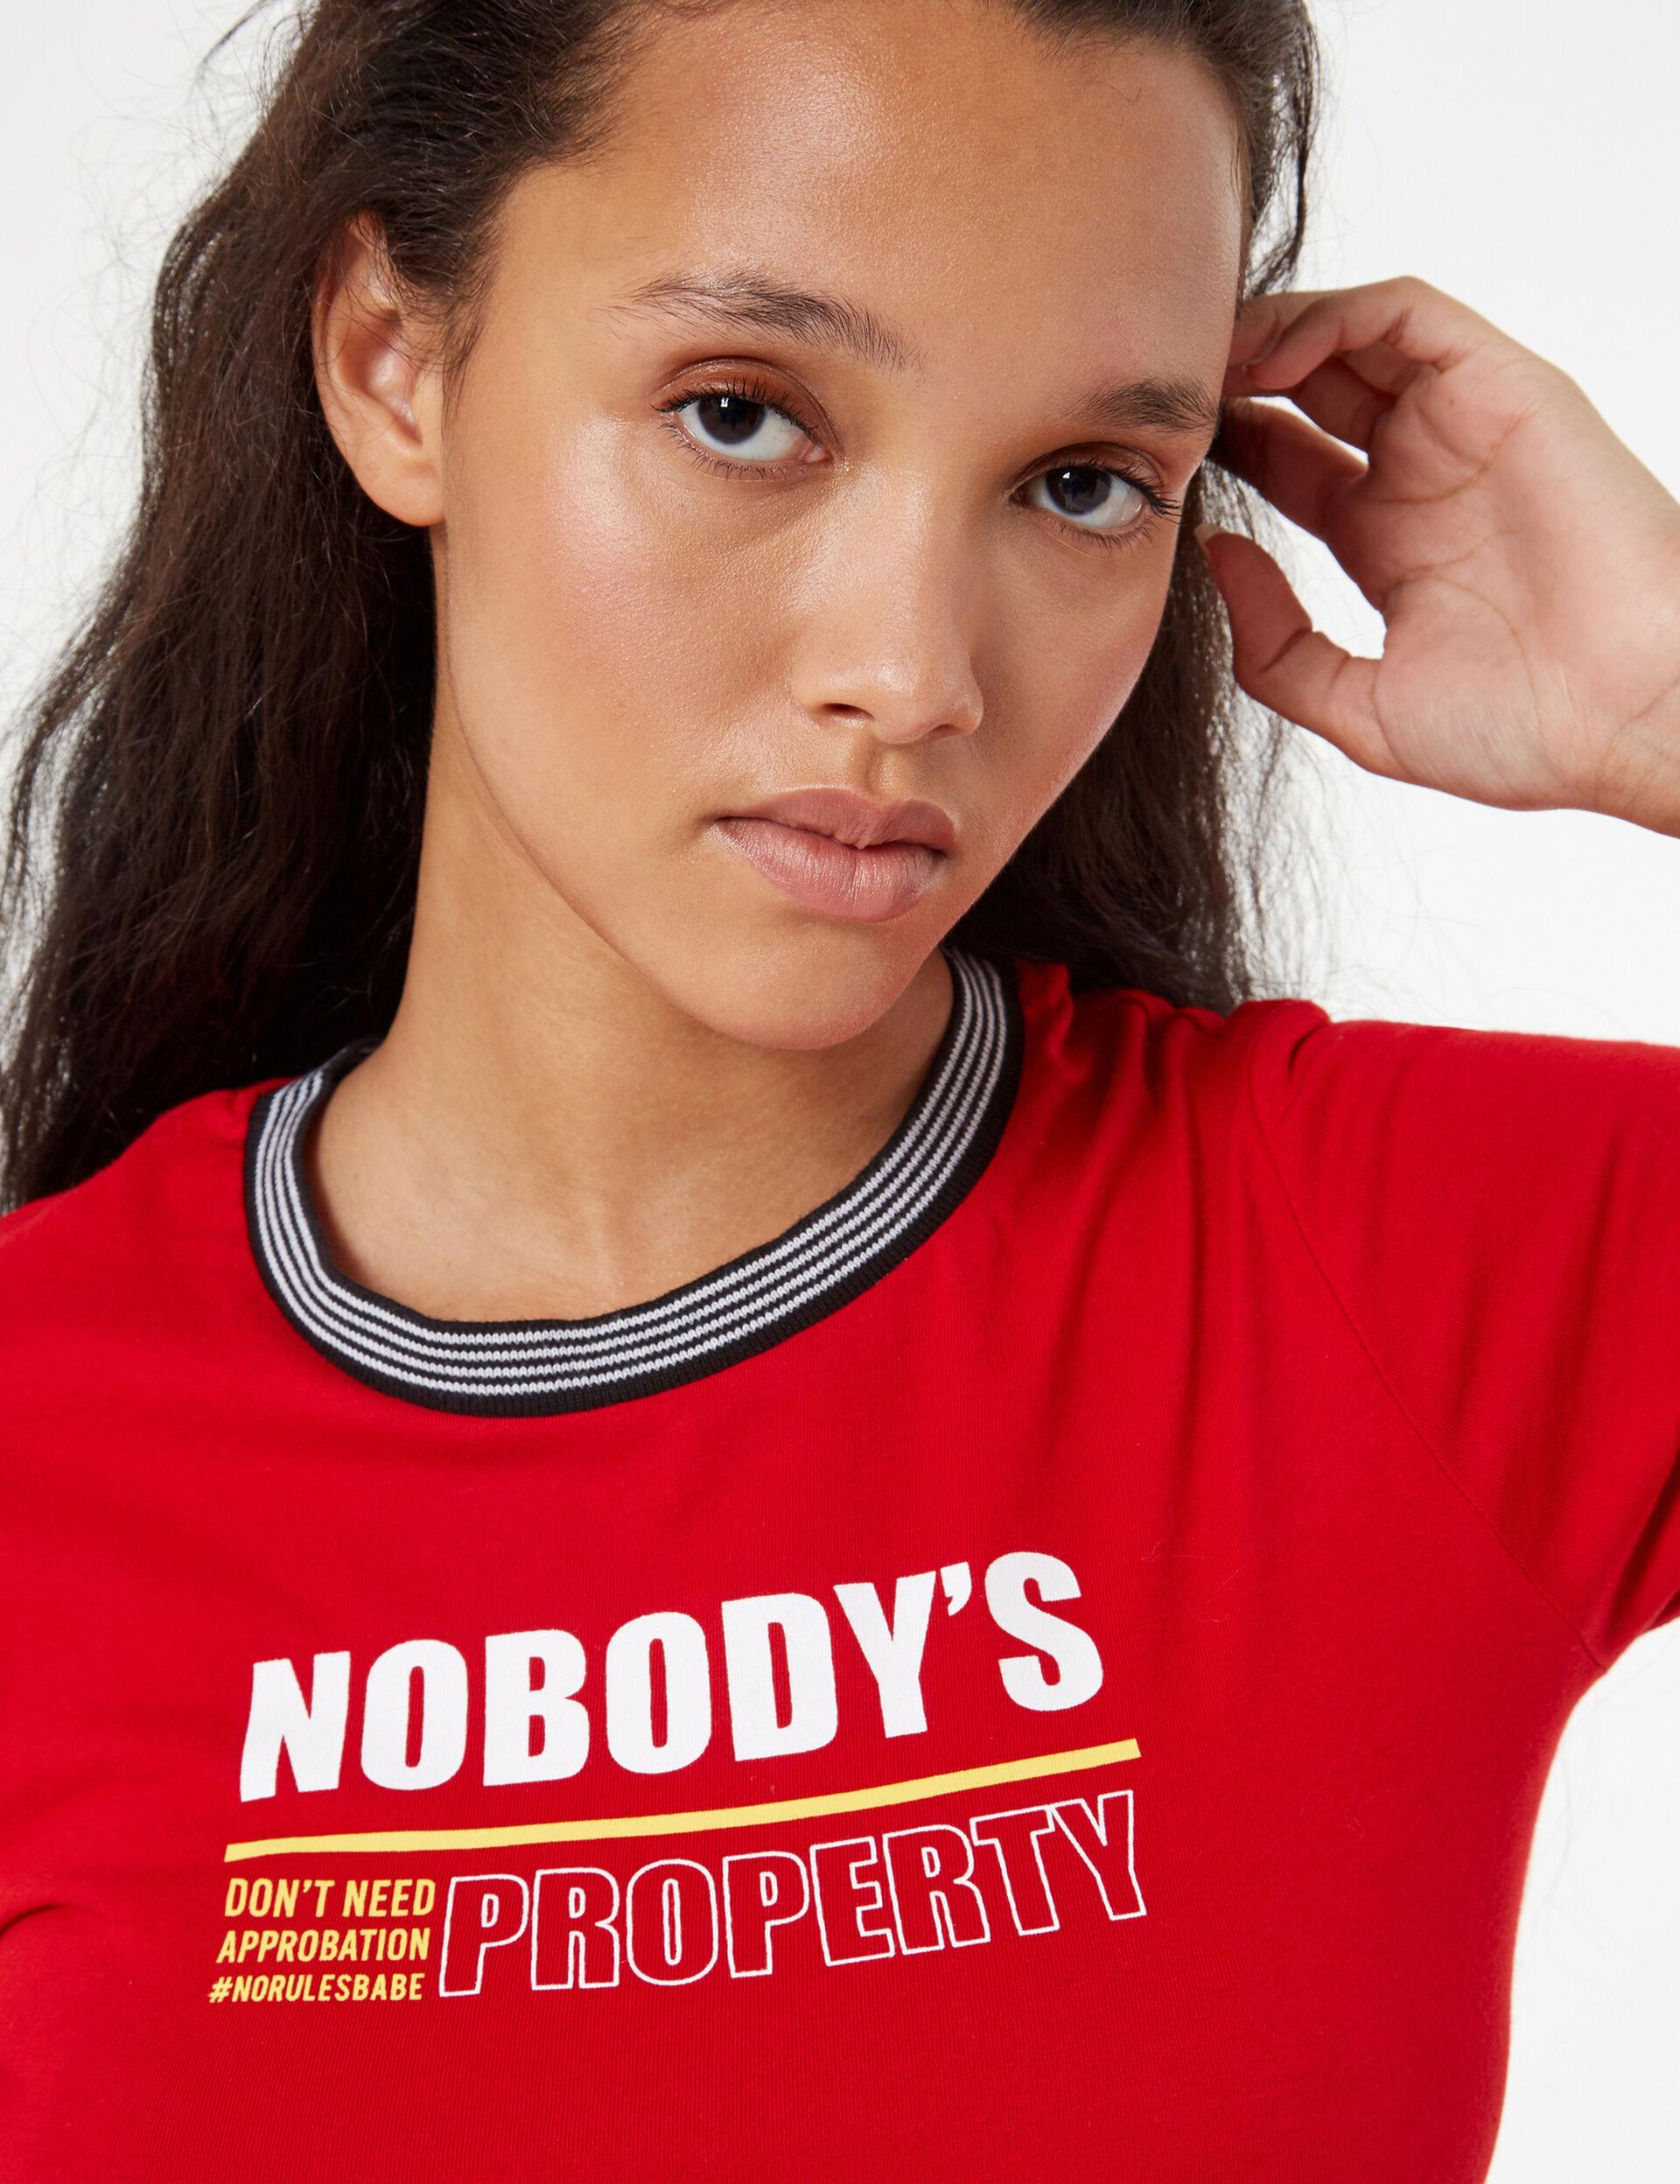 Nobody's property t-shirt